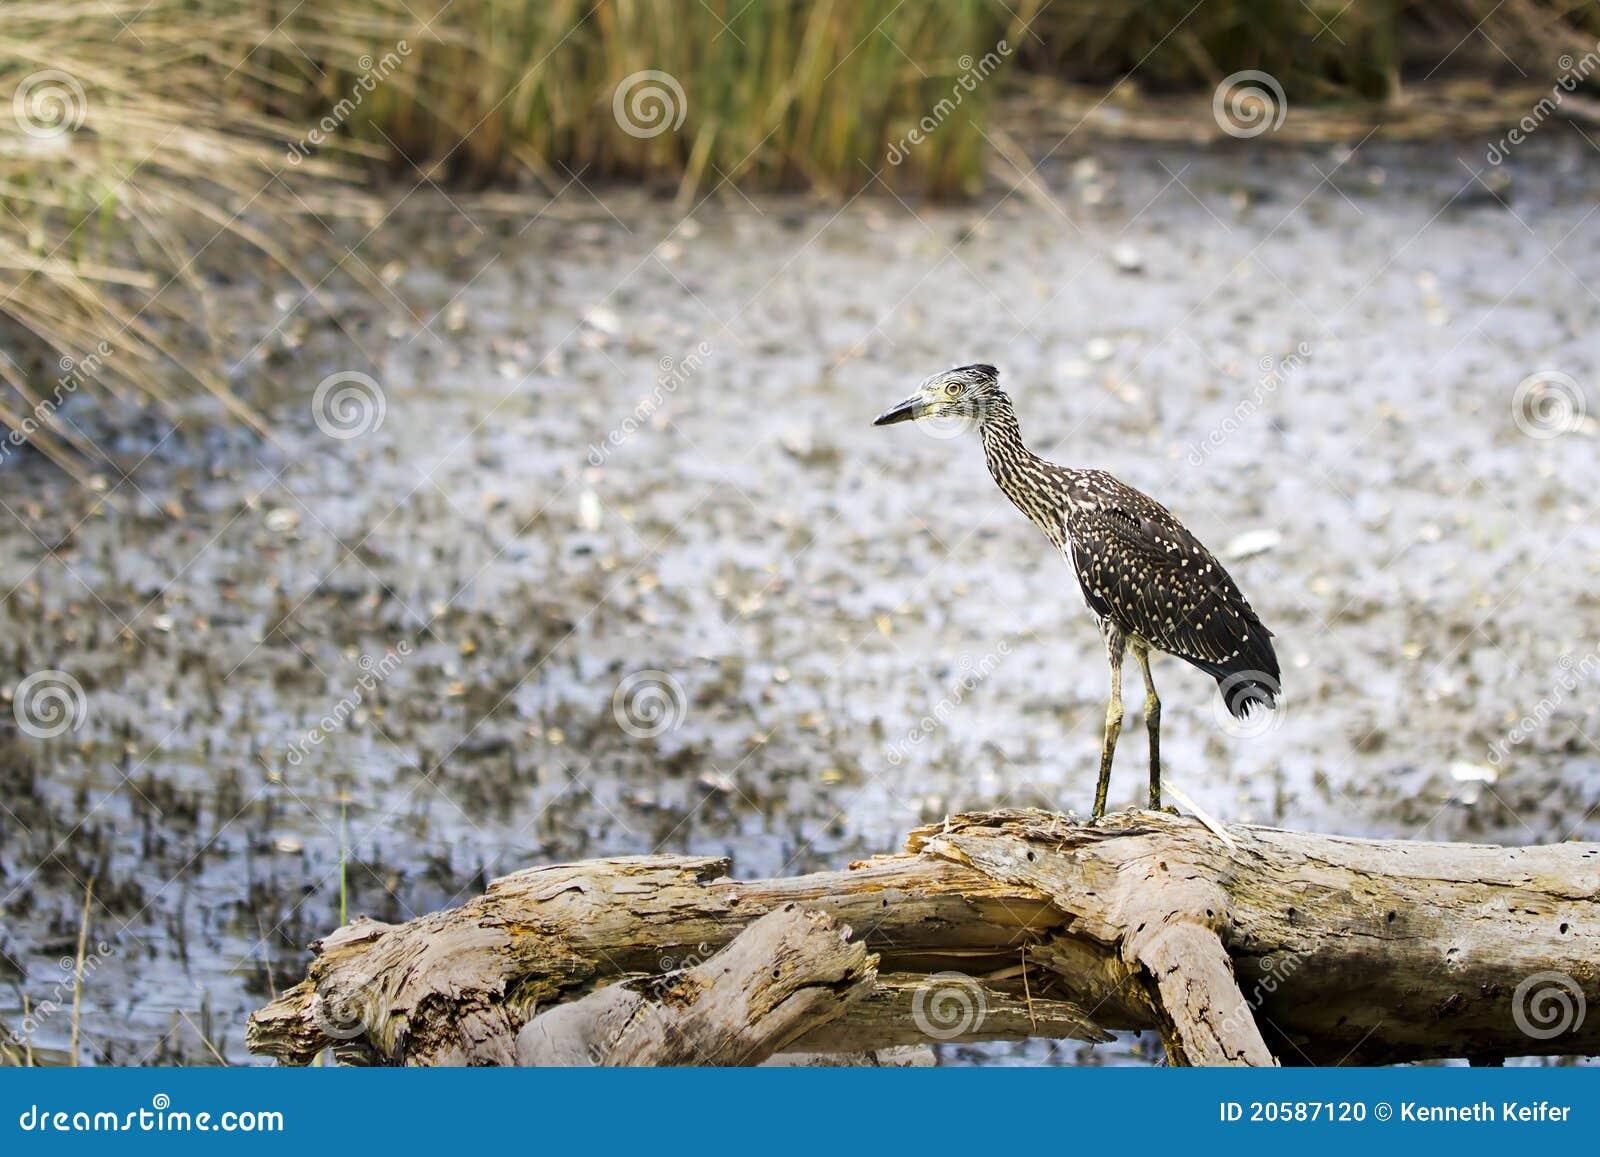 Black-Crowned Night Heron immature